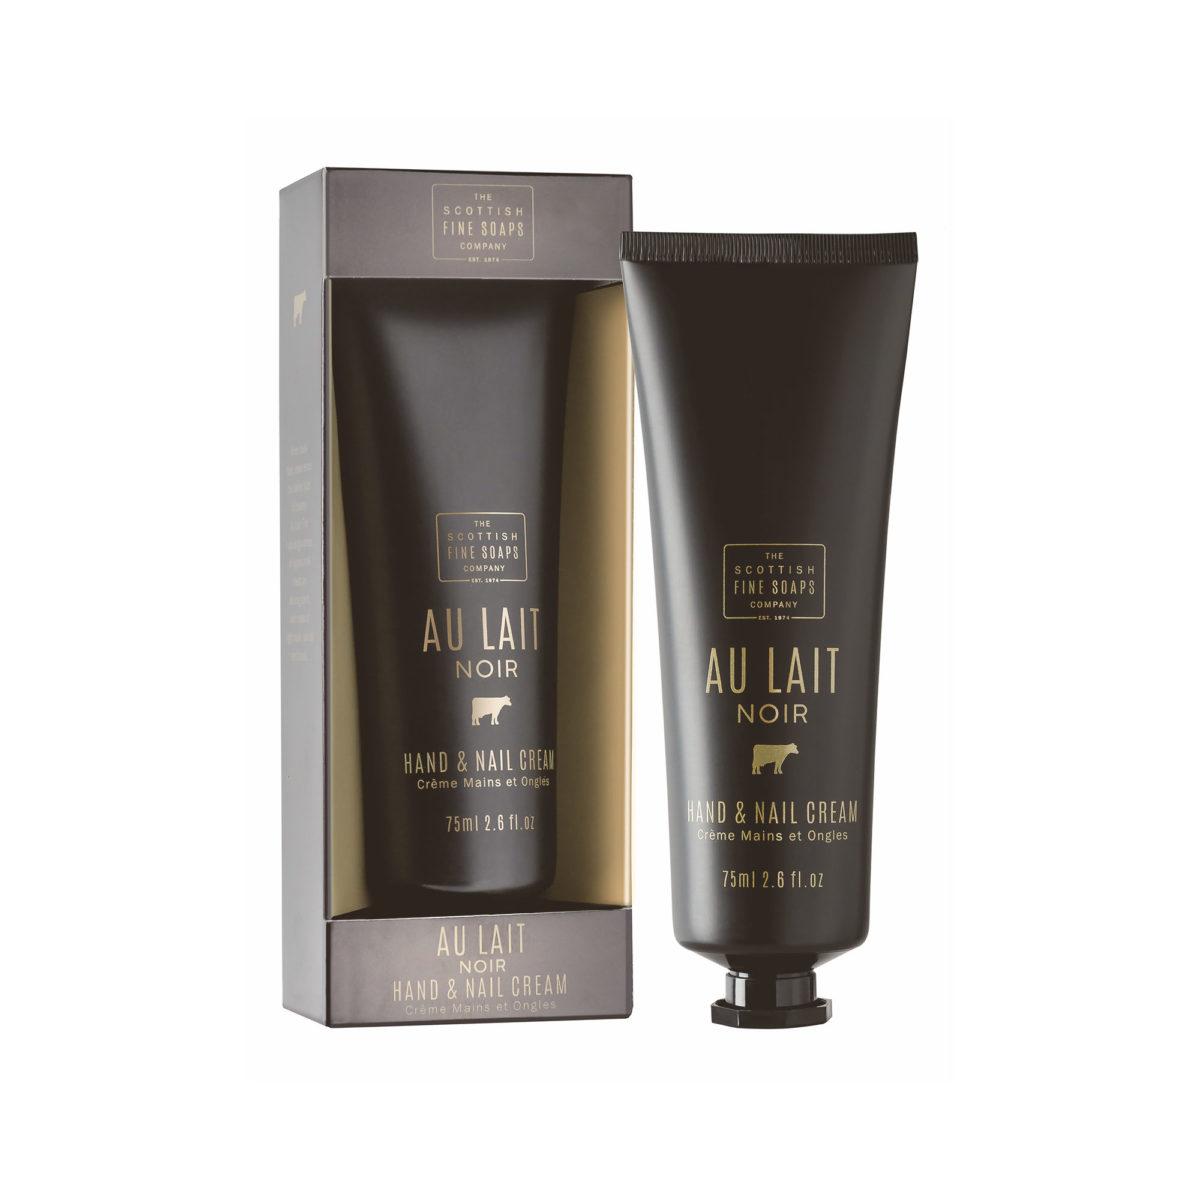 Au Lait Noir Hand & Nail Cream